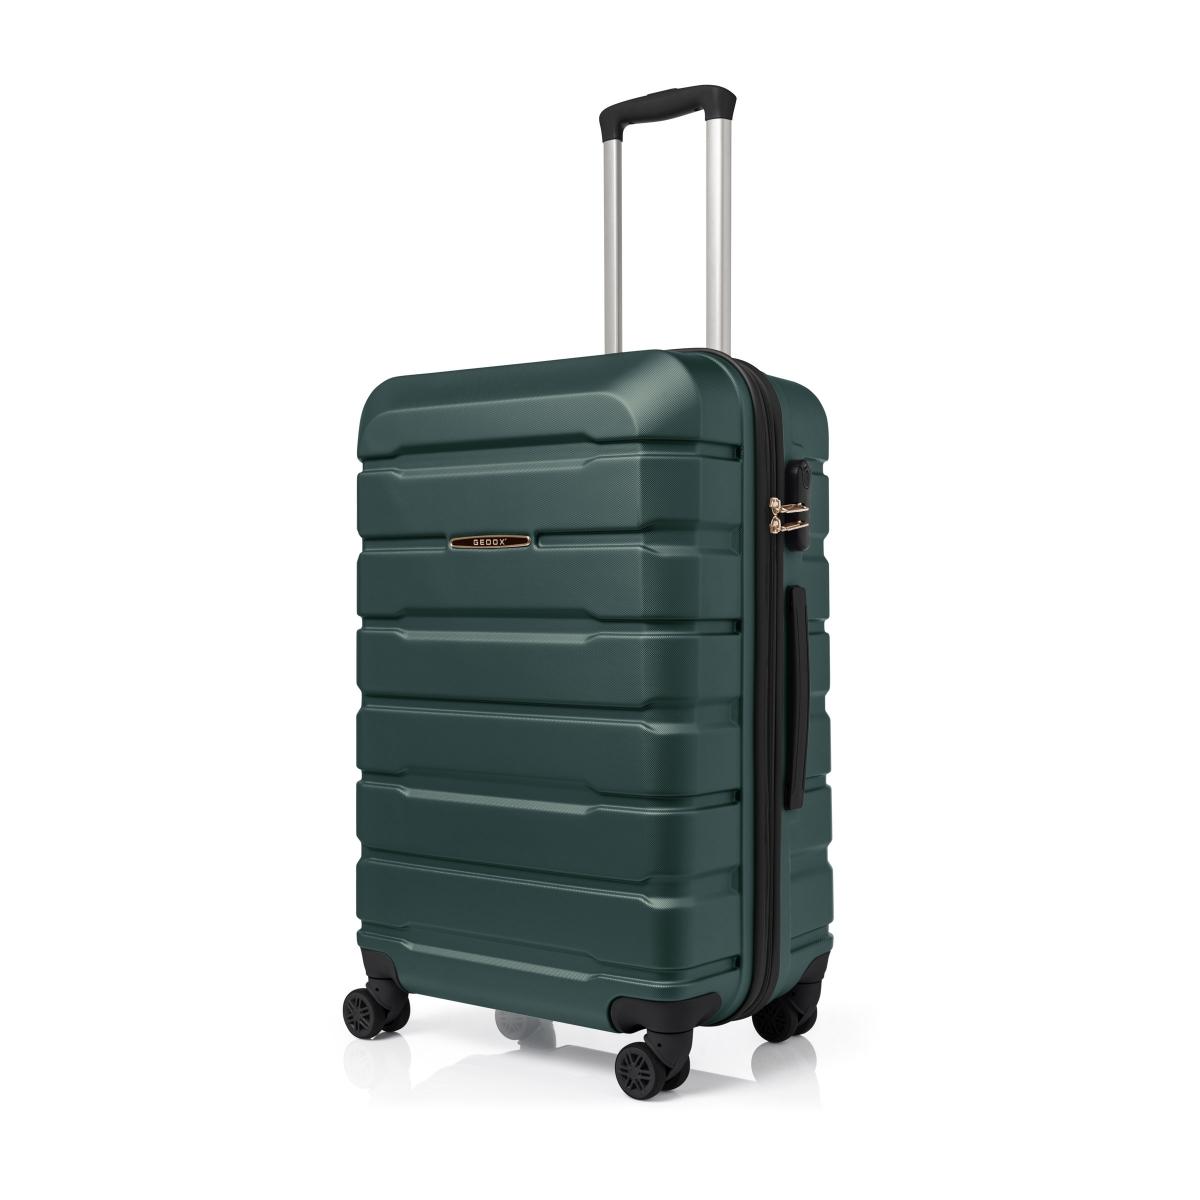 Gedox Abs Premium Tonaton 3'lü Valiz Seyahat Seti - Model:500.07 Haki Yeşil